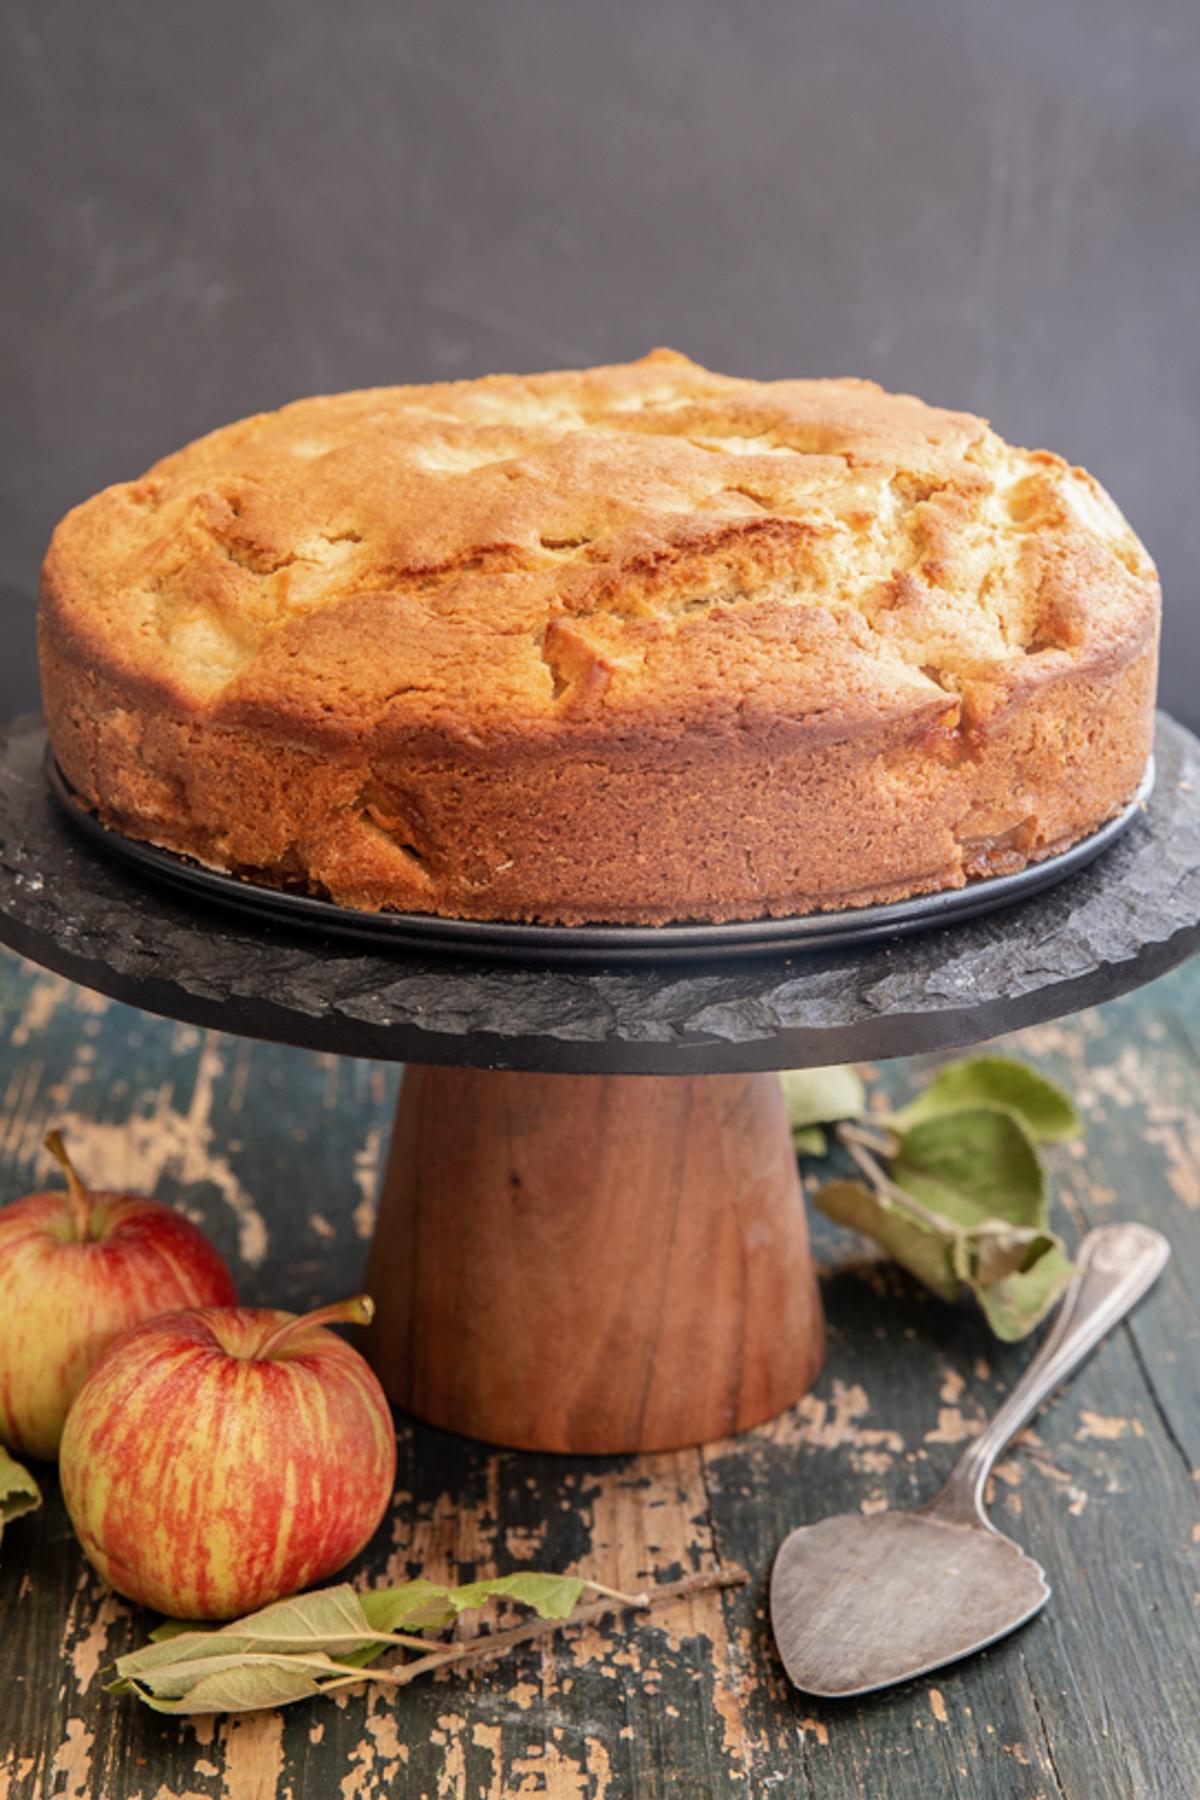 Apple cake on a black cake stand.